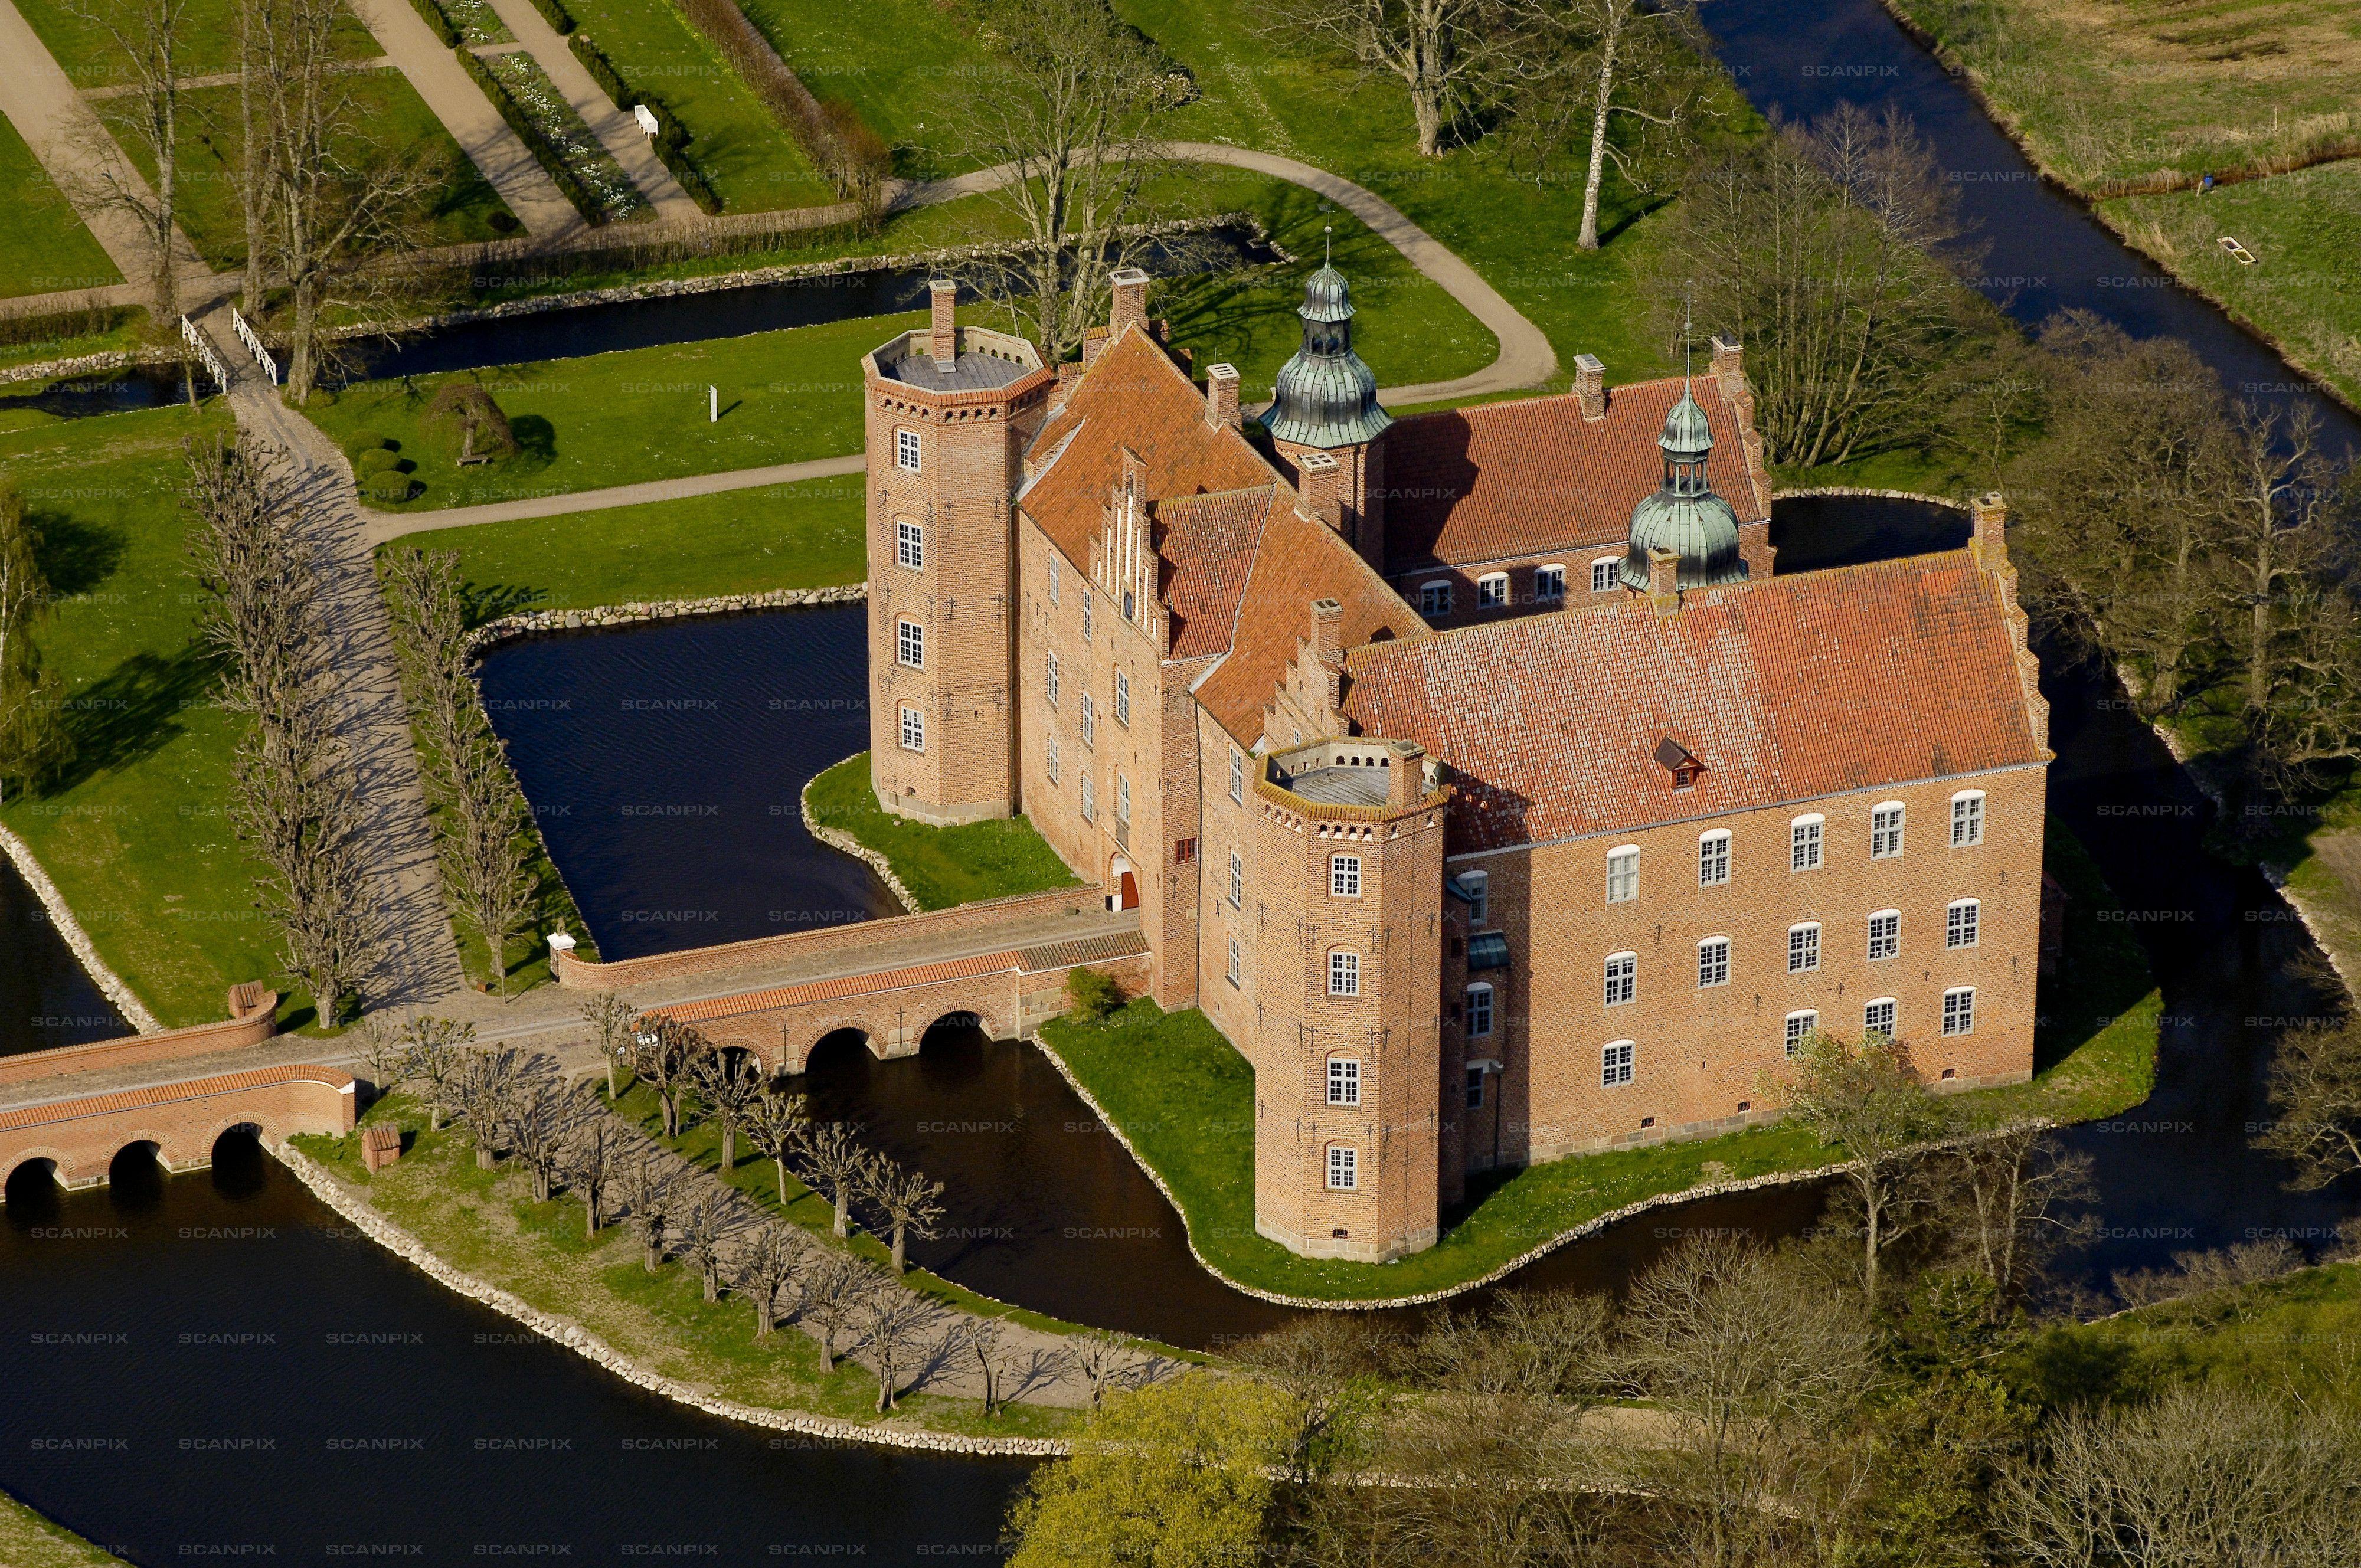 gangbang Aalborg gl Estrup Slot